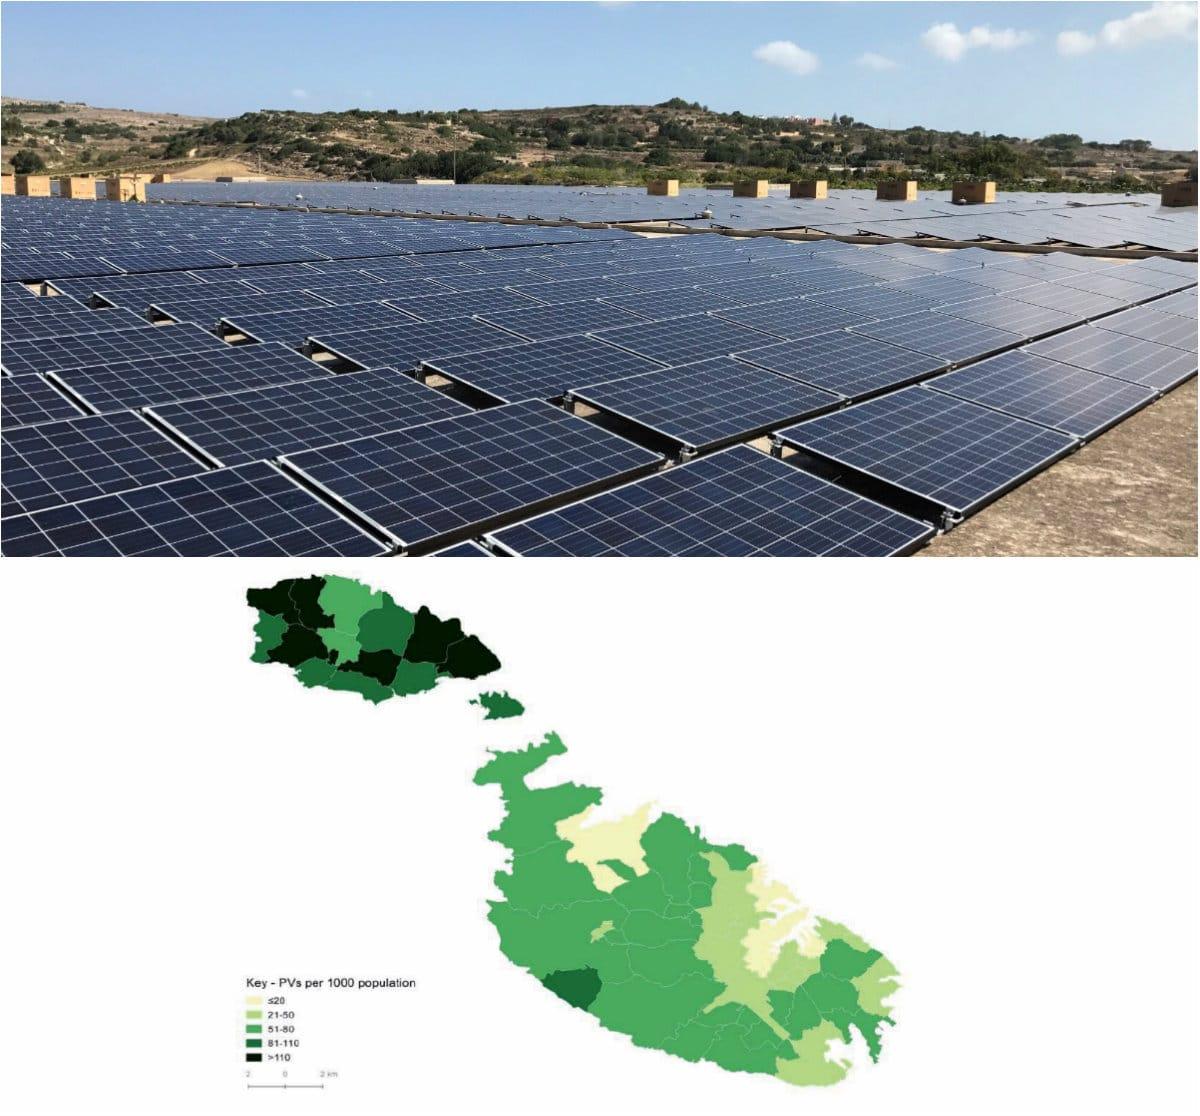 PV Malta increase map